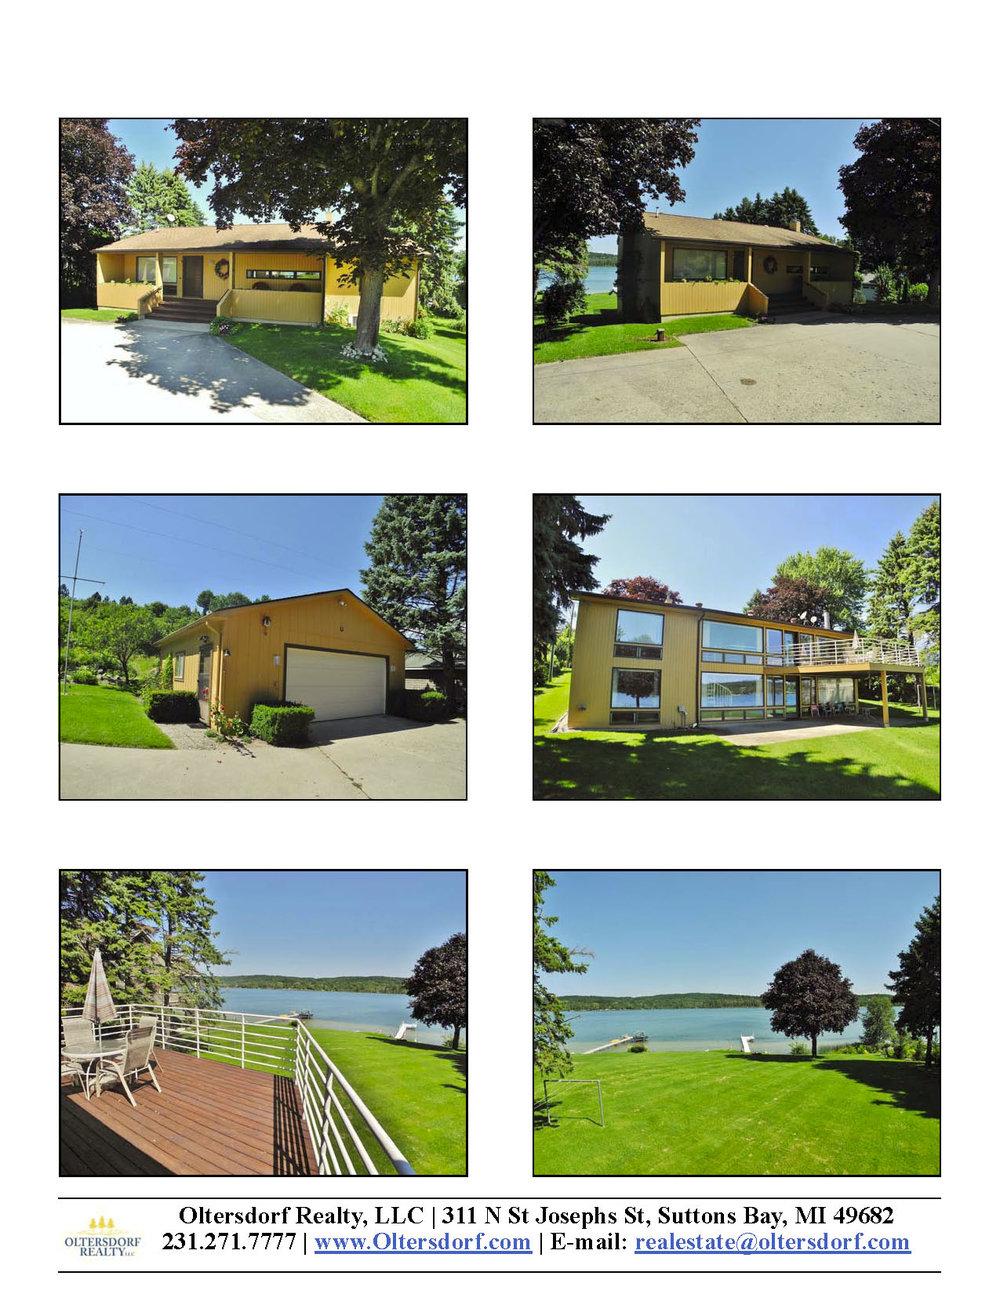 2091 S Lake Shore Drive - Oltersdorf Realty LLC Marketing Packet_Page_02.jpg